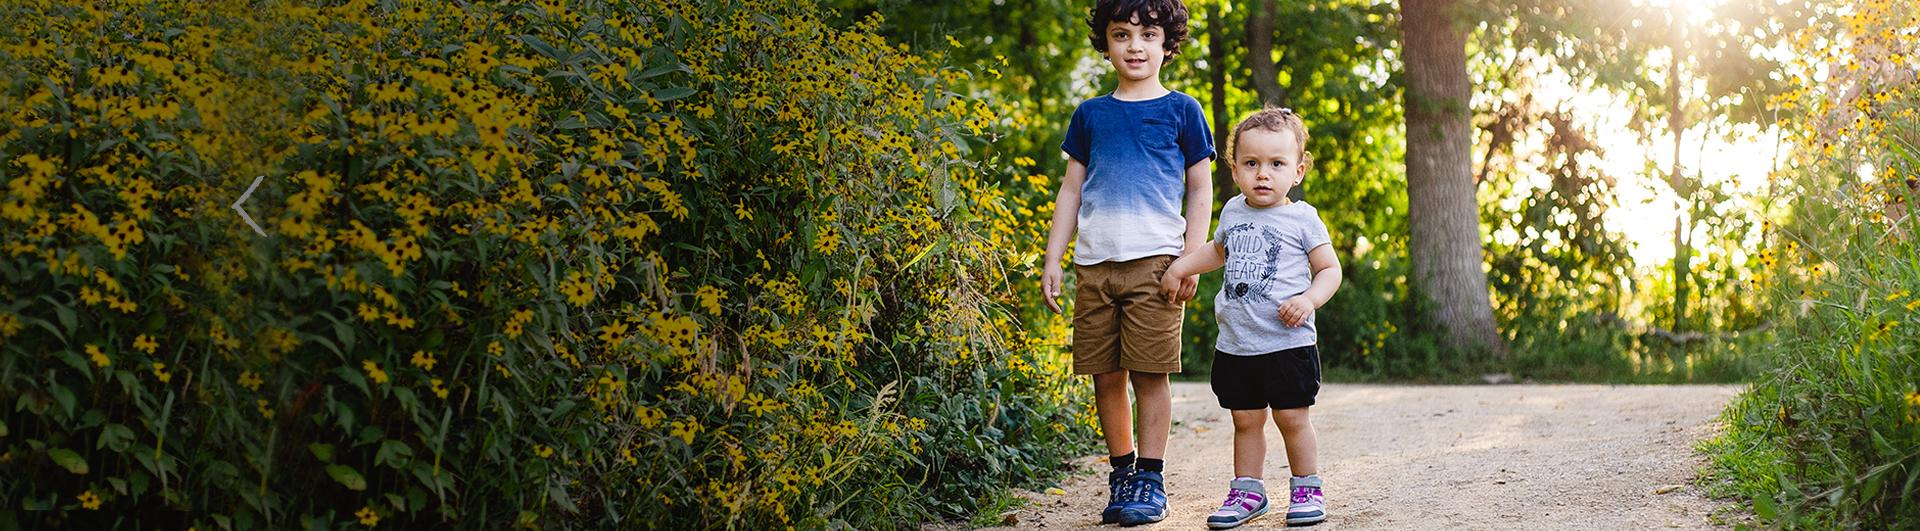 Two Kids walking on a trail